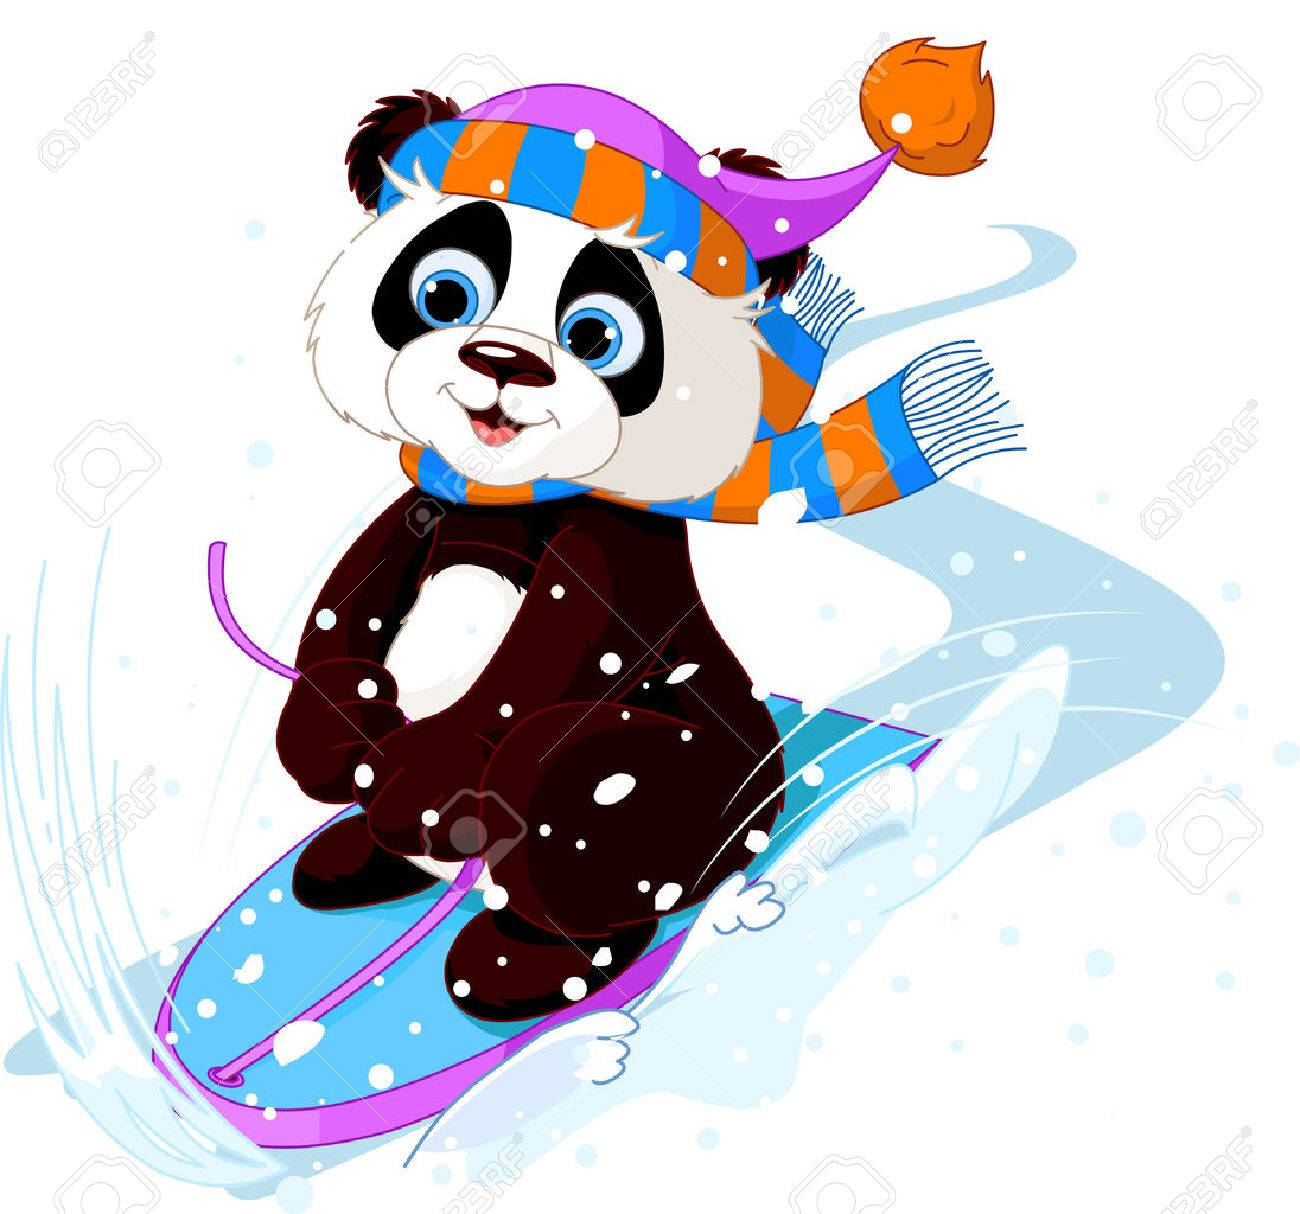 Cute punda sledding downhill winter snow mountain - 24908153